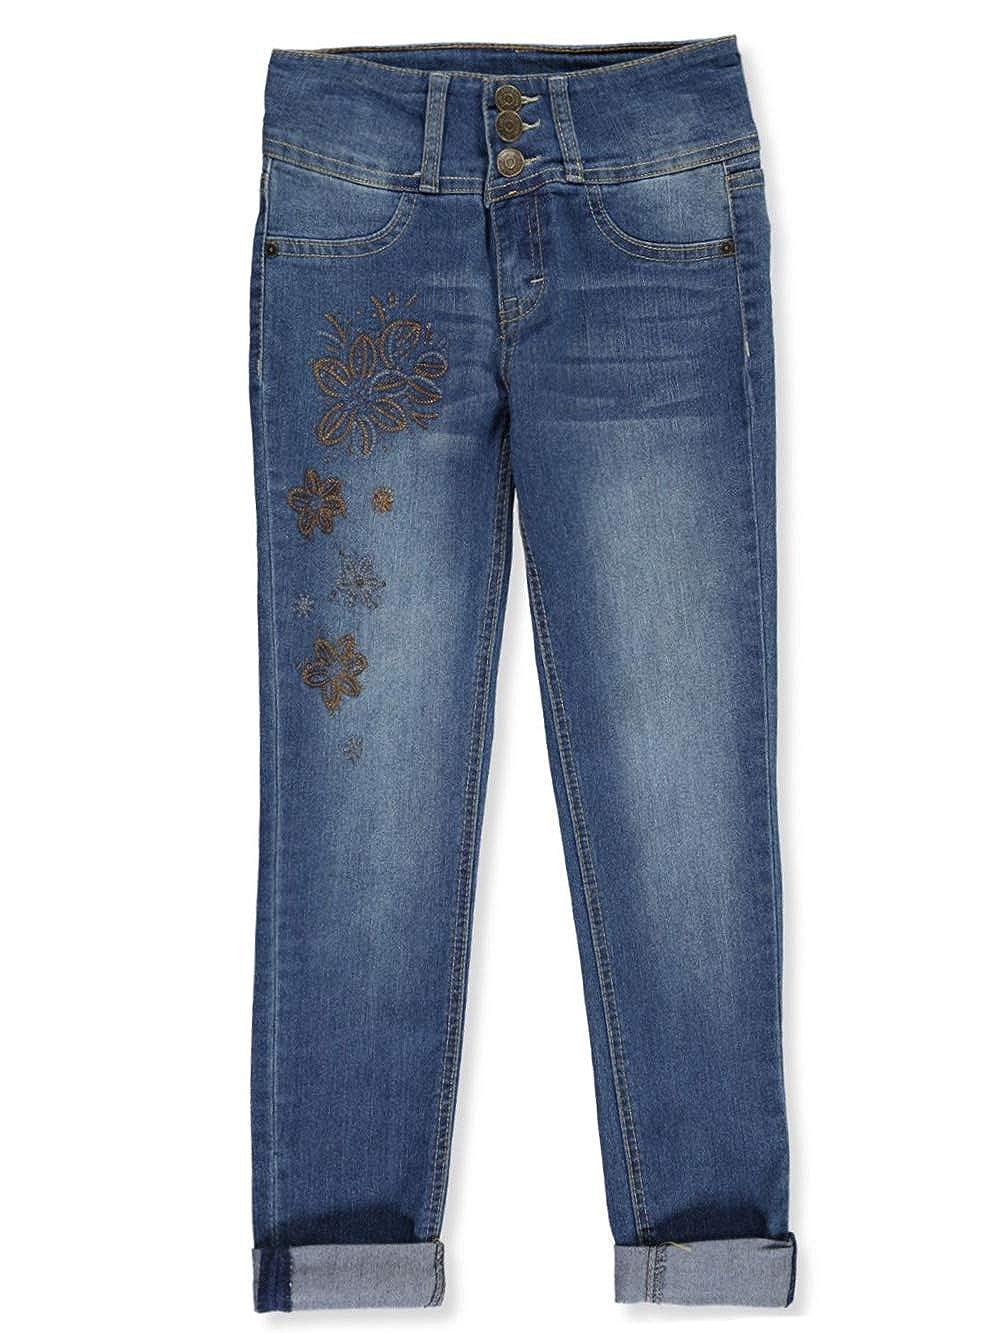 LEE Girls Sequined Flower High Waist Skinny Jeans